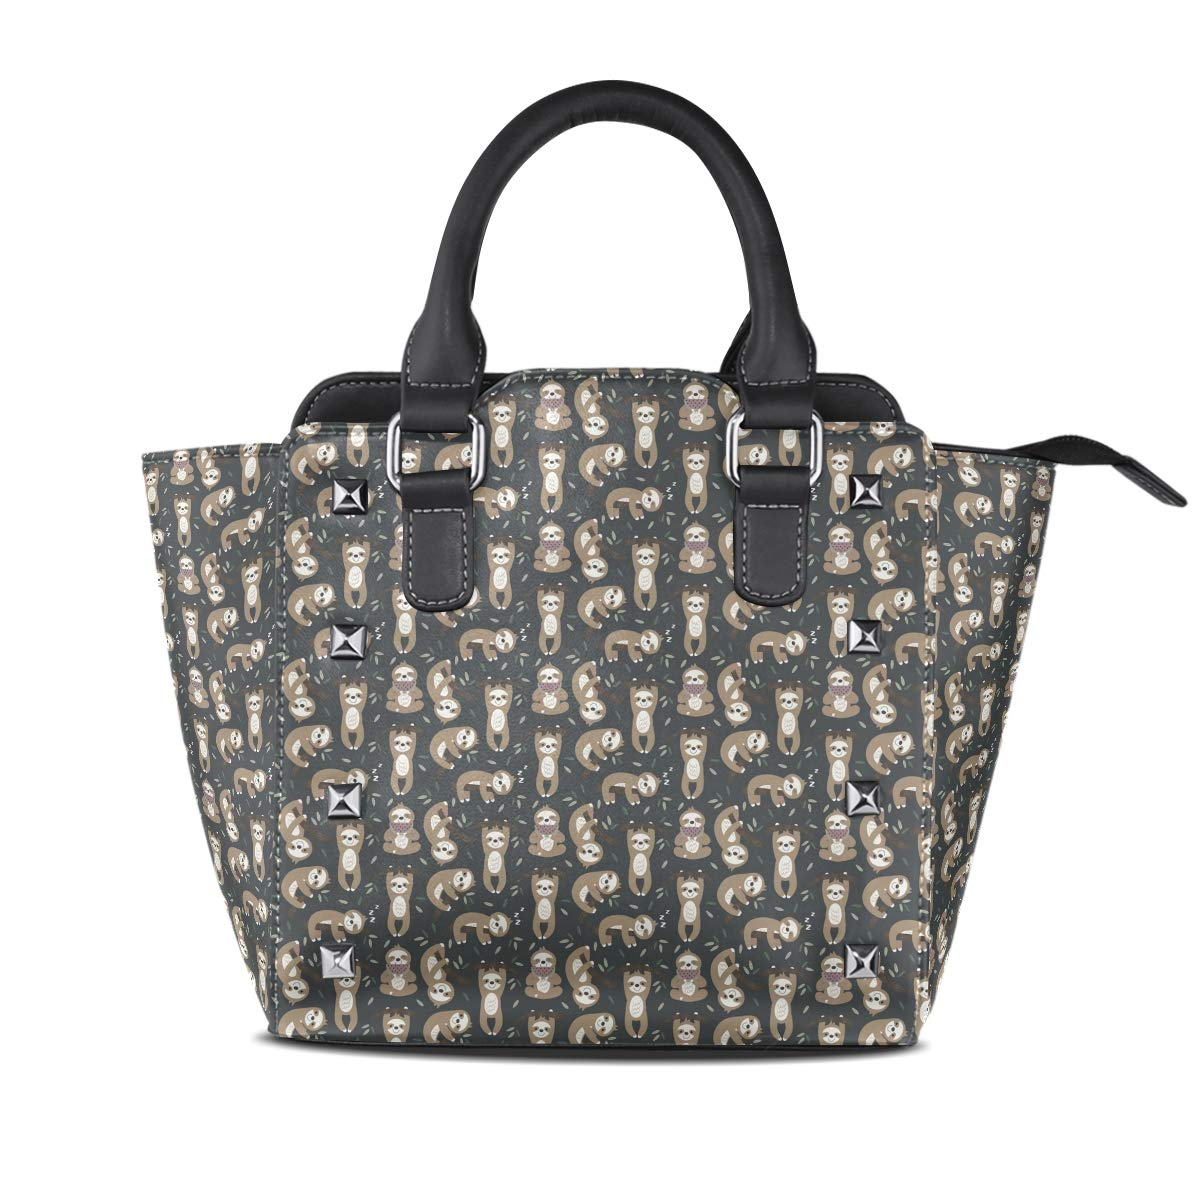 Design 4 Handbag Unicorn Genuine Leather Tote Rivet Bag Shoulder Strap Top Handle Women